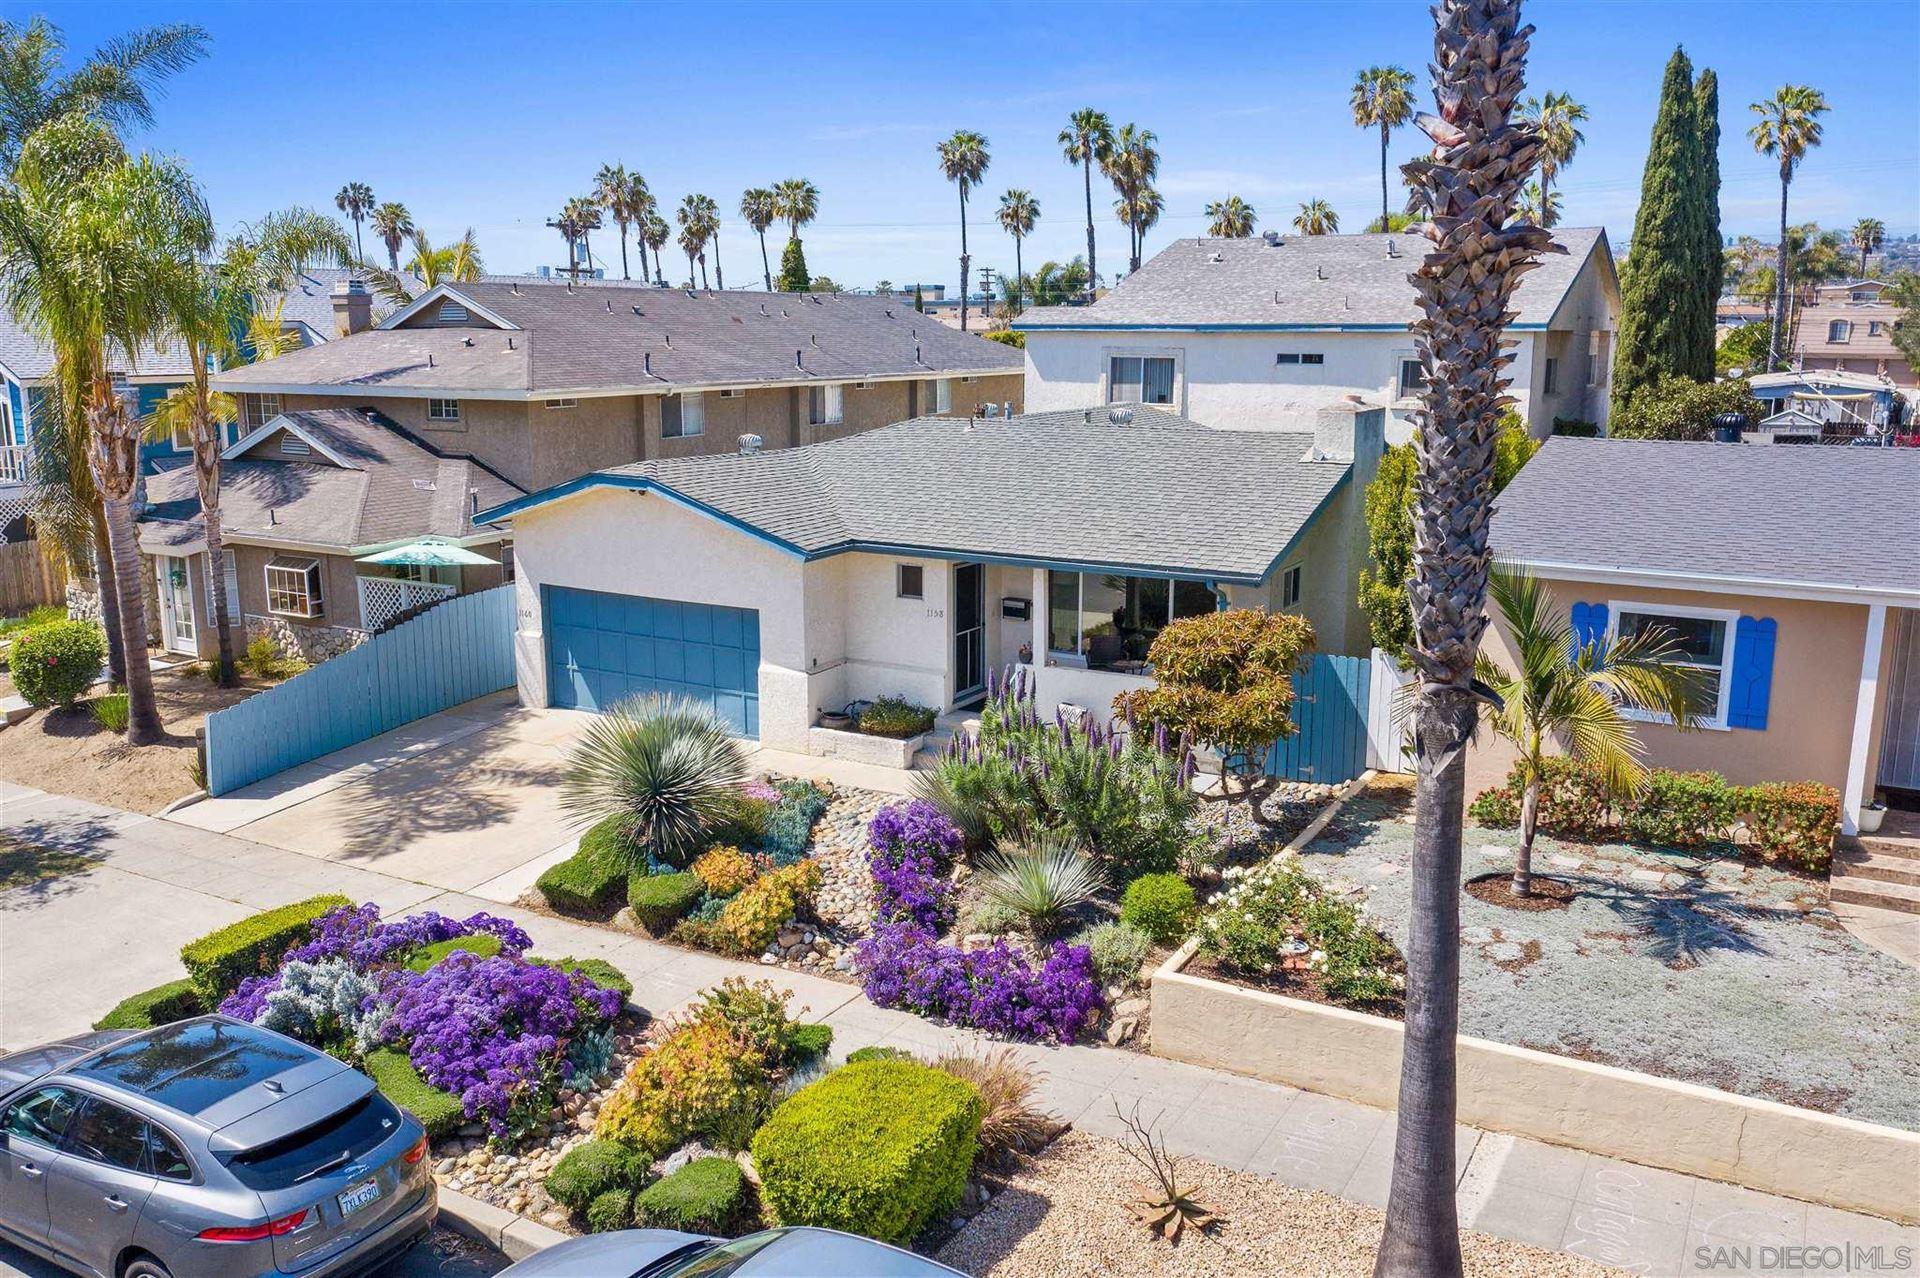 Photo of 1158 Thomas Ave., San Diego, CA 92109 (MLS # 210009540)